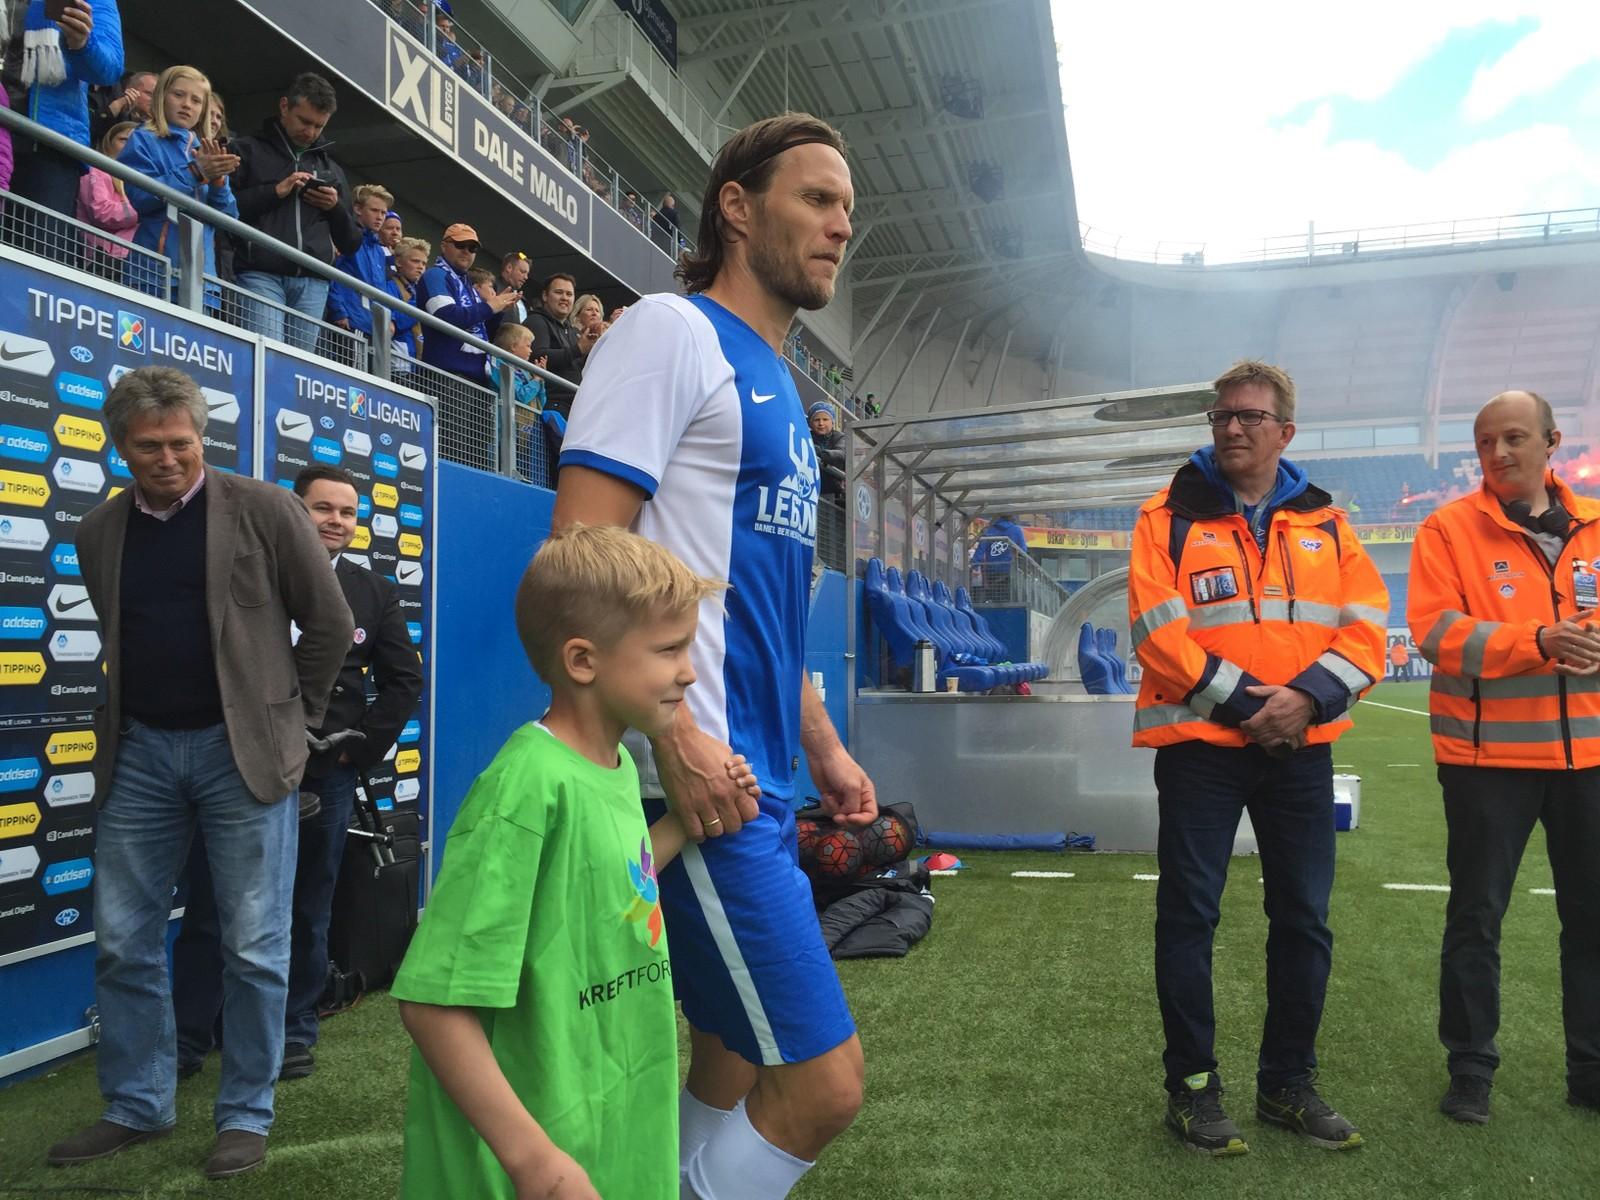 HEDRET: Berg Hestad har spilt 900 kamper for Molde. I dag er det siste dagen han spiller på Aker Stadion.